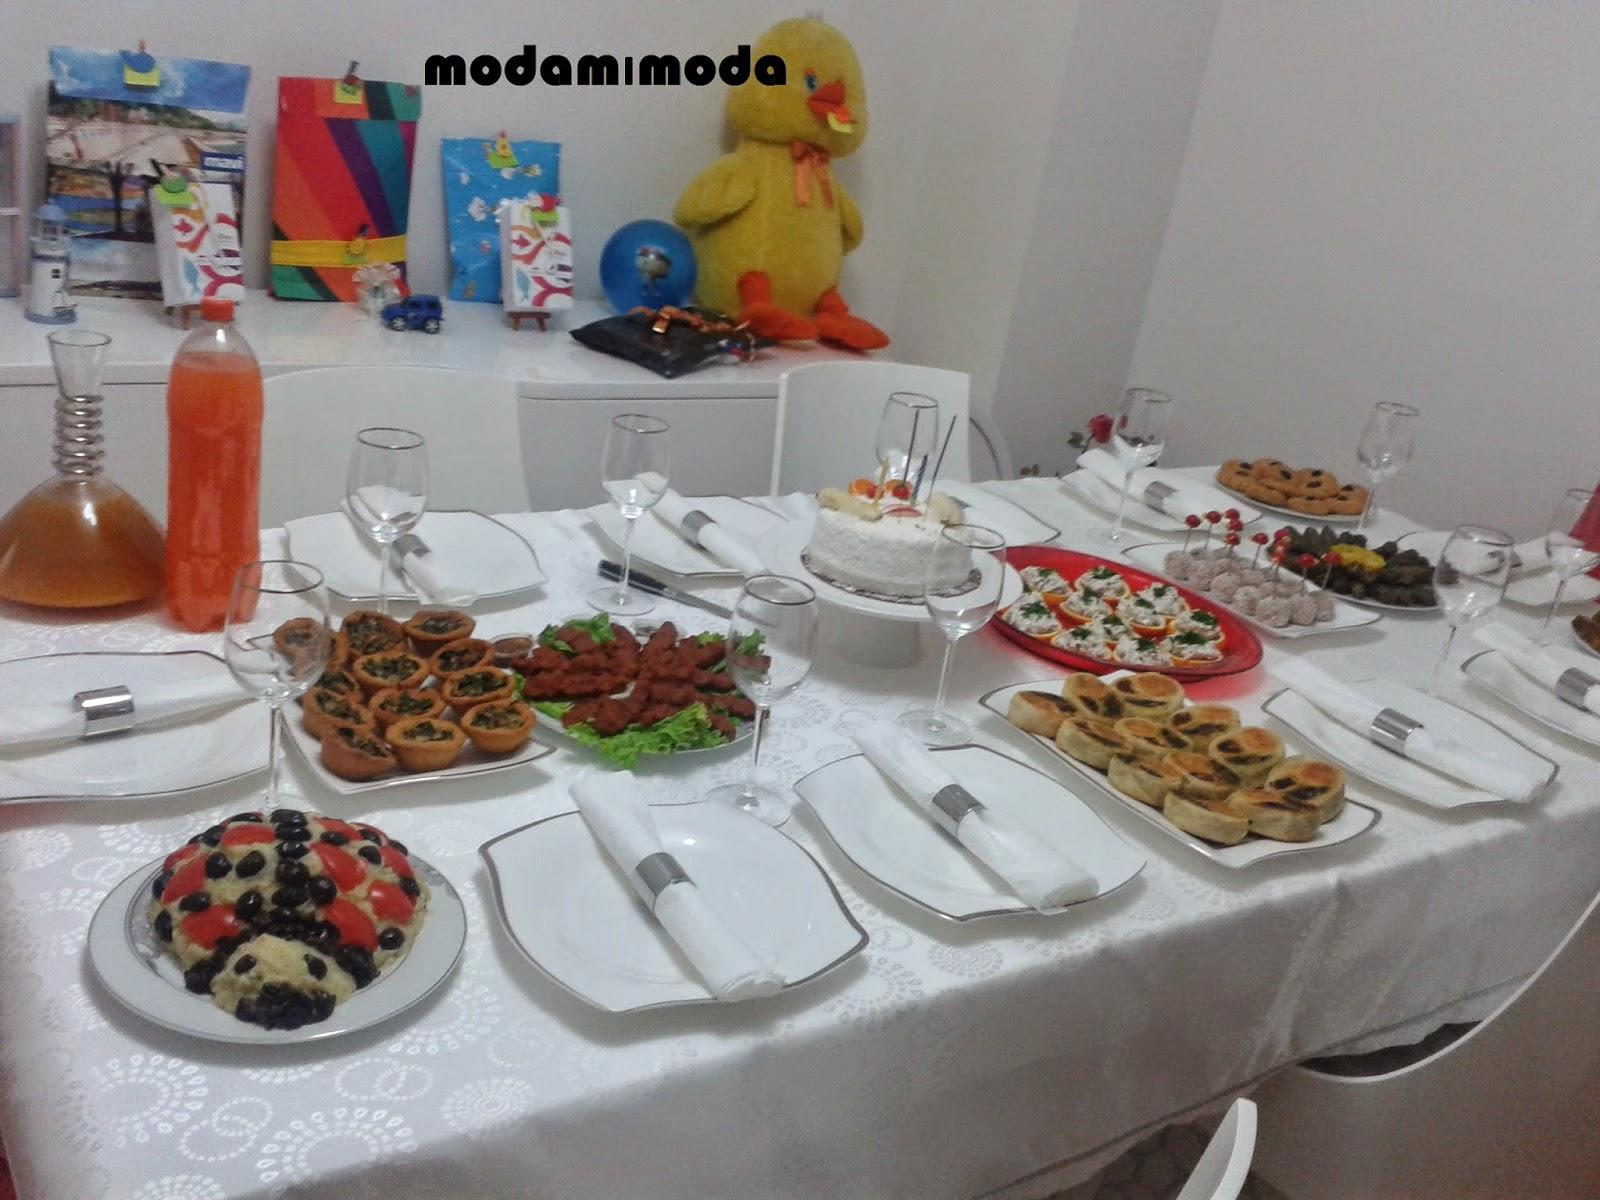 çocuk doğumgünü partisi